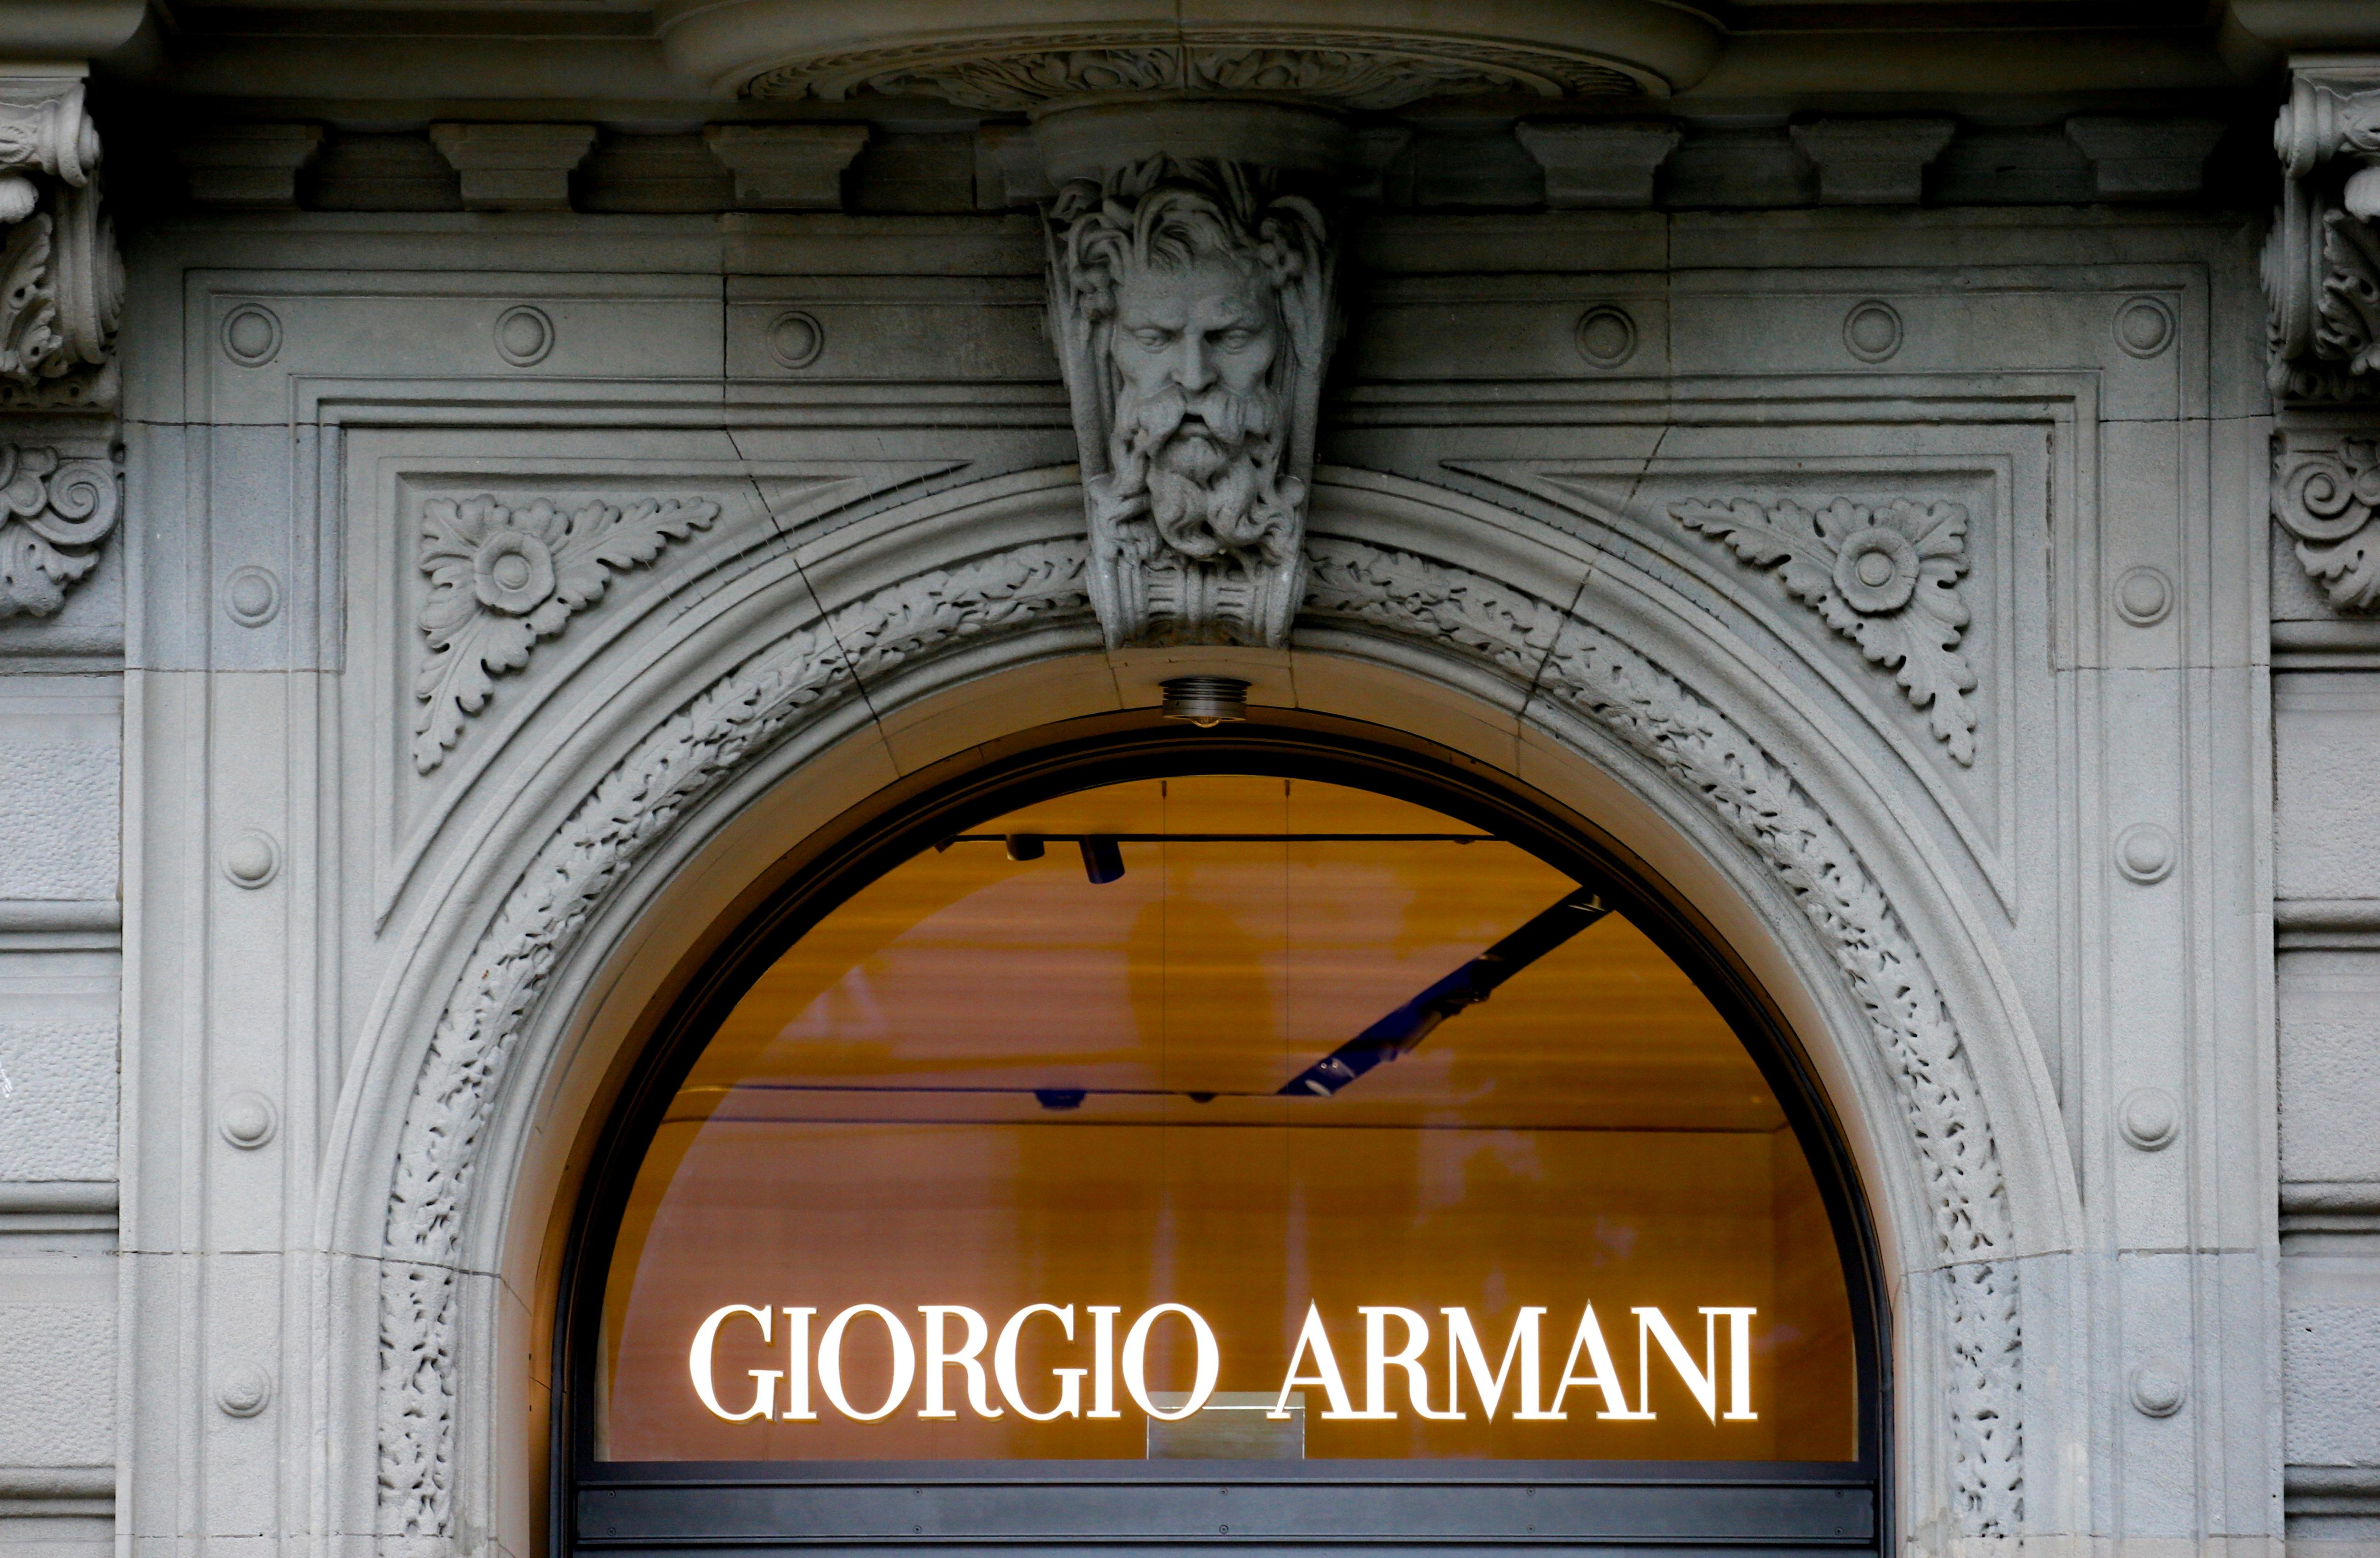 The logo of Italian fashion company Giorgio Armani is seen at a shop in Zurich, Switzerland July 8, 2021.  REUTERS/Arnd Wiegmann/File Photo